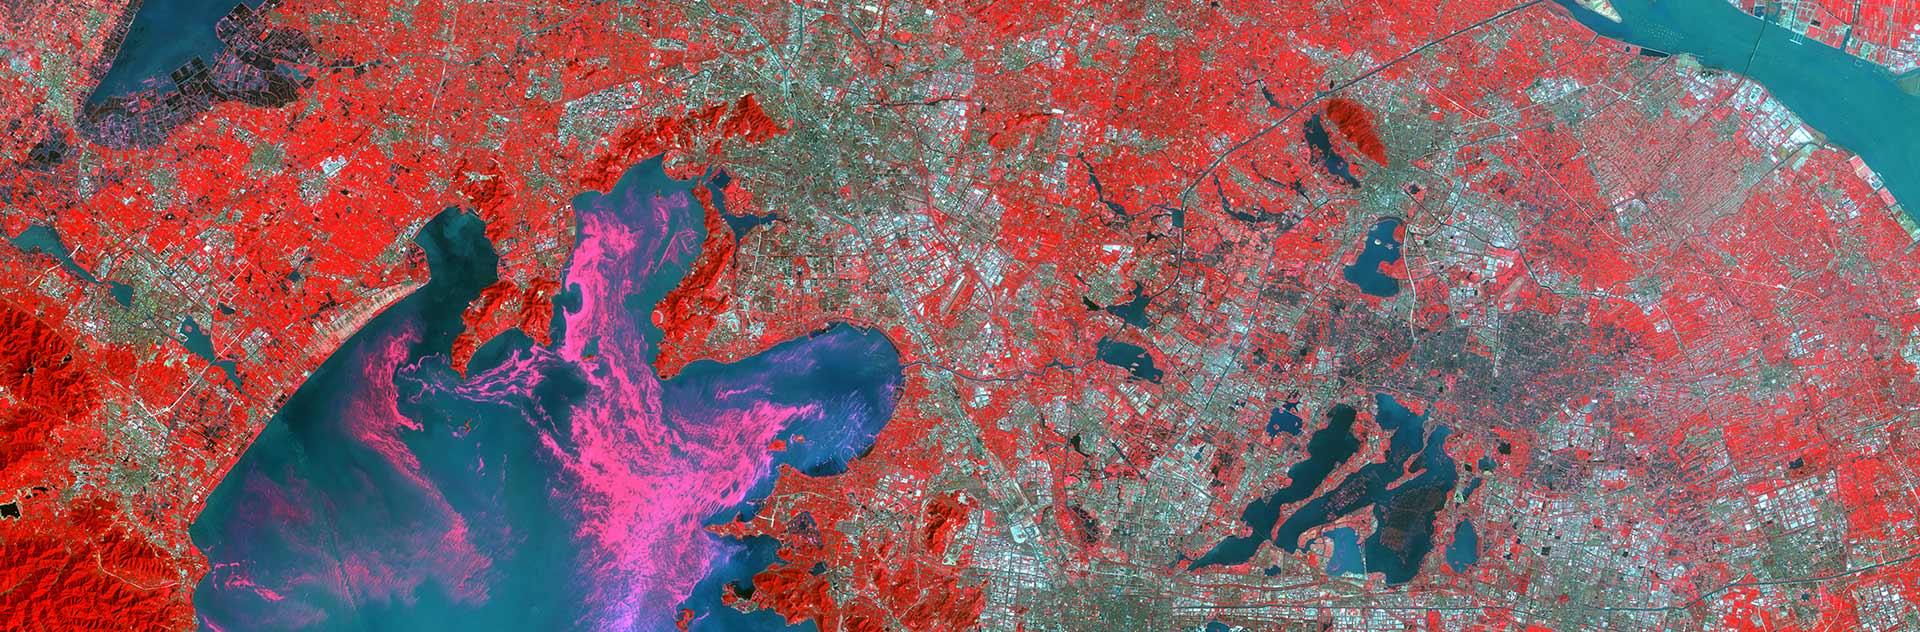 DMC Constellation Satellite Image - Algal Bloom - Taihu Lake